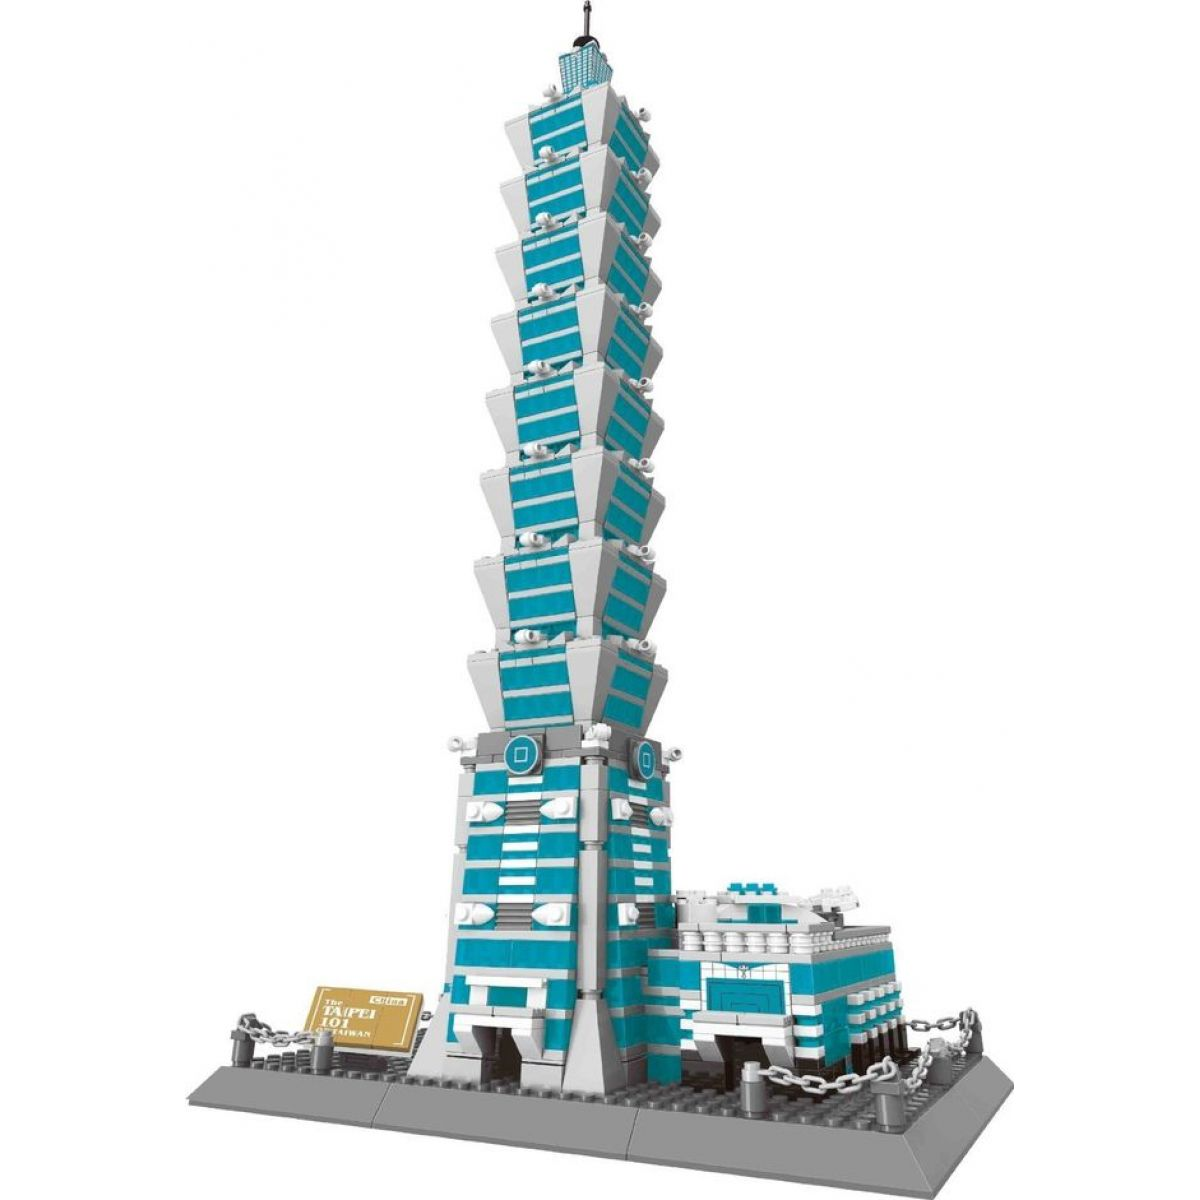 Stavebnice Tchaj-Pej 101 mrakodrap 1511 dílků